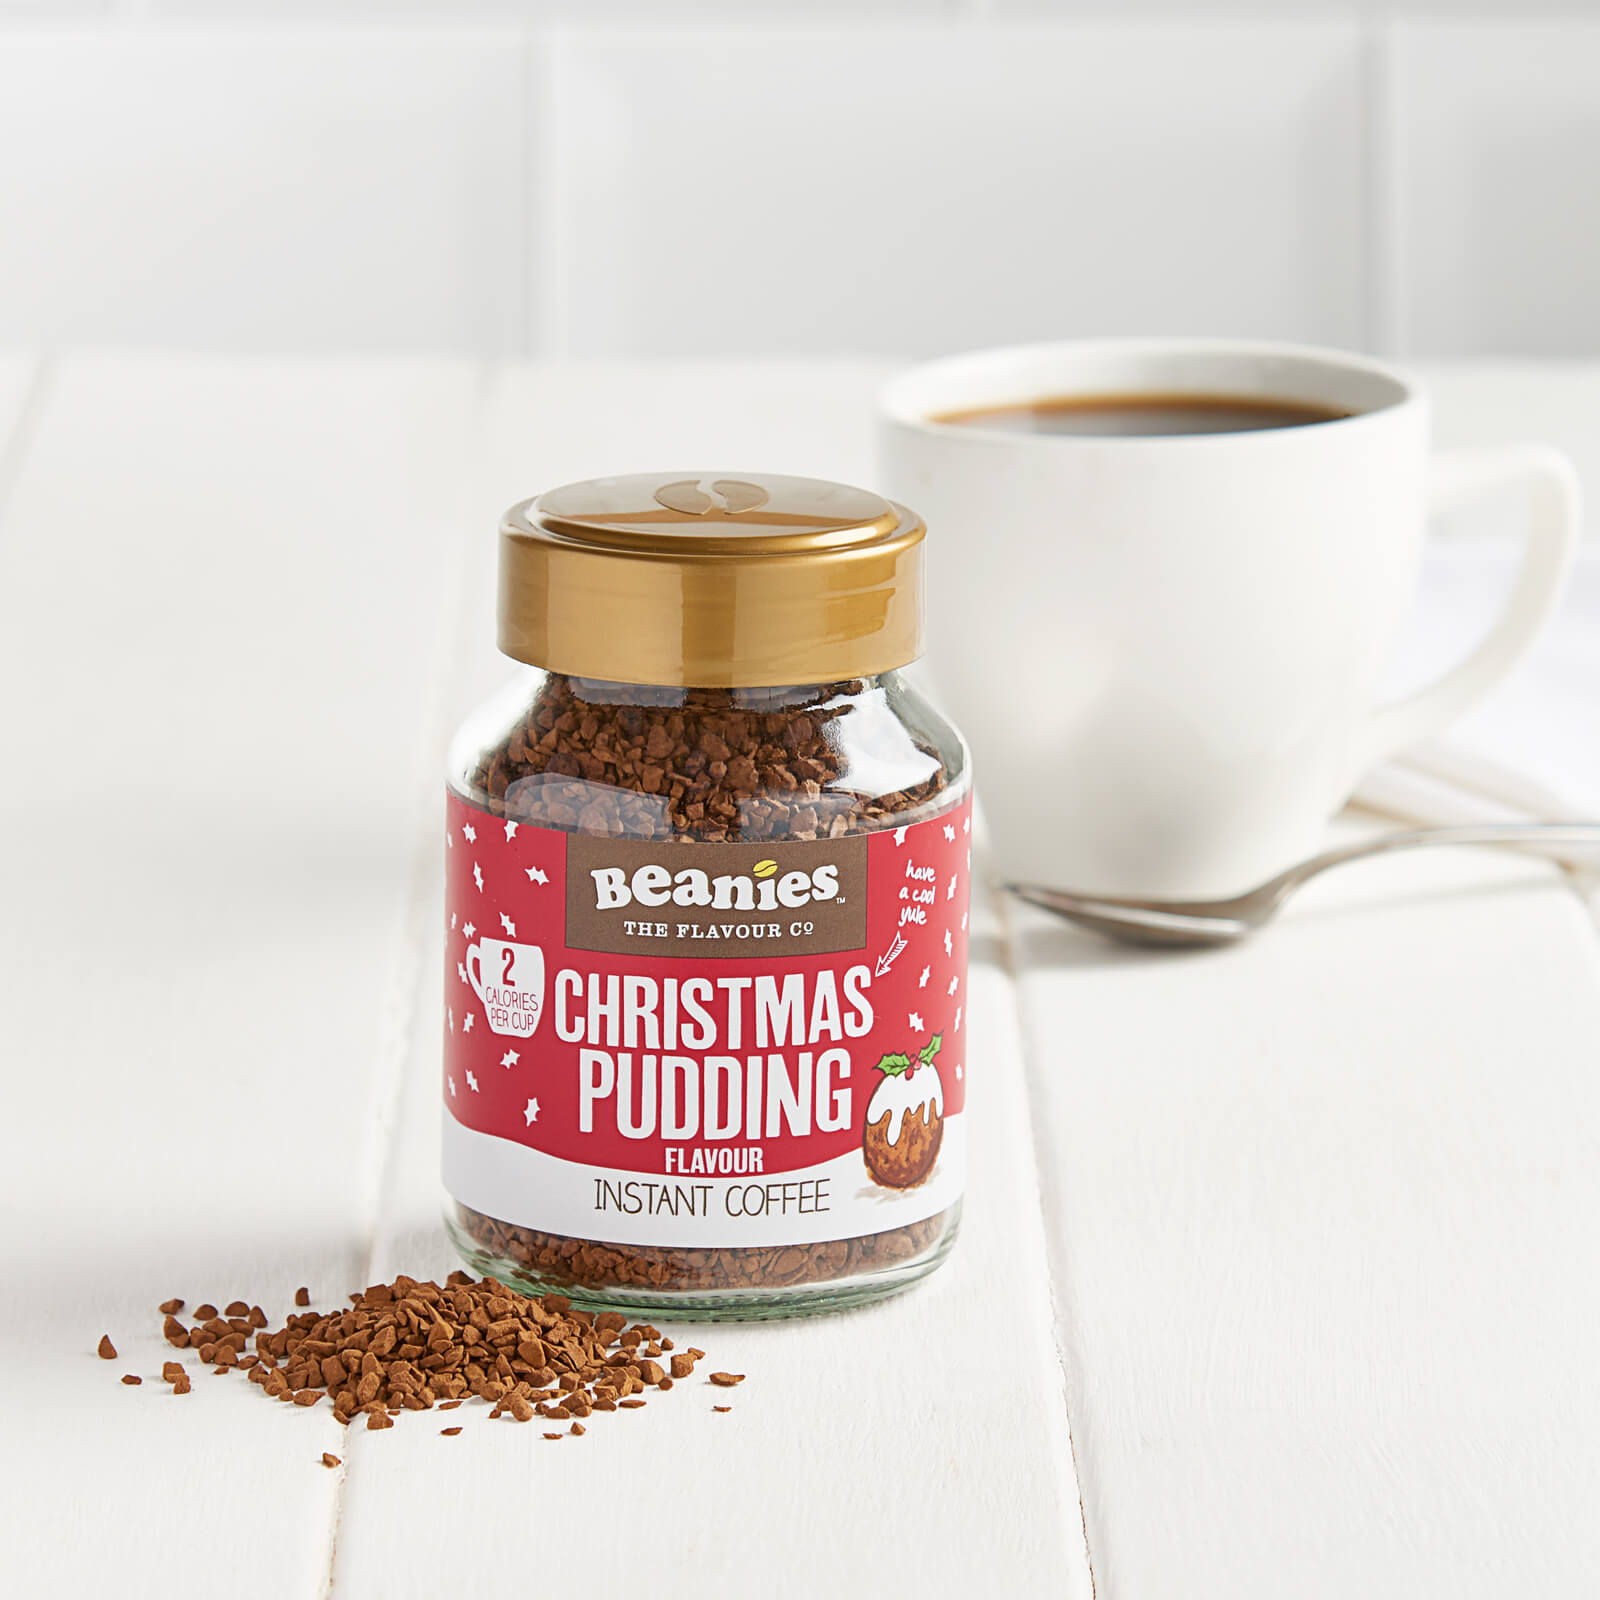 0cd8d7b94fb Beanies Irish Cream Flavour Instant Coffee. £2.49. Offer